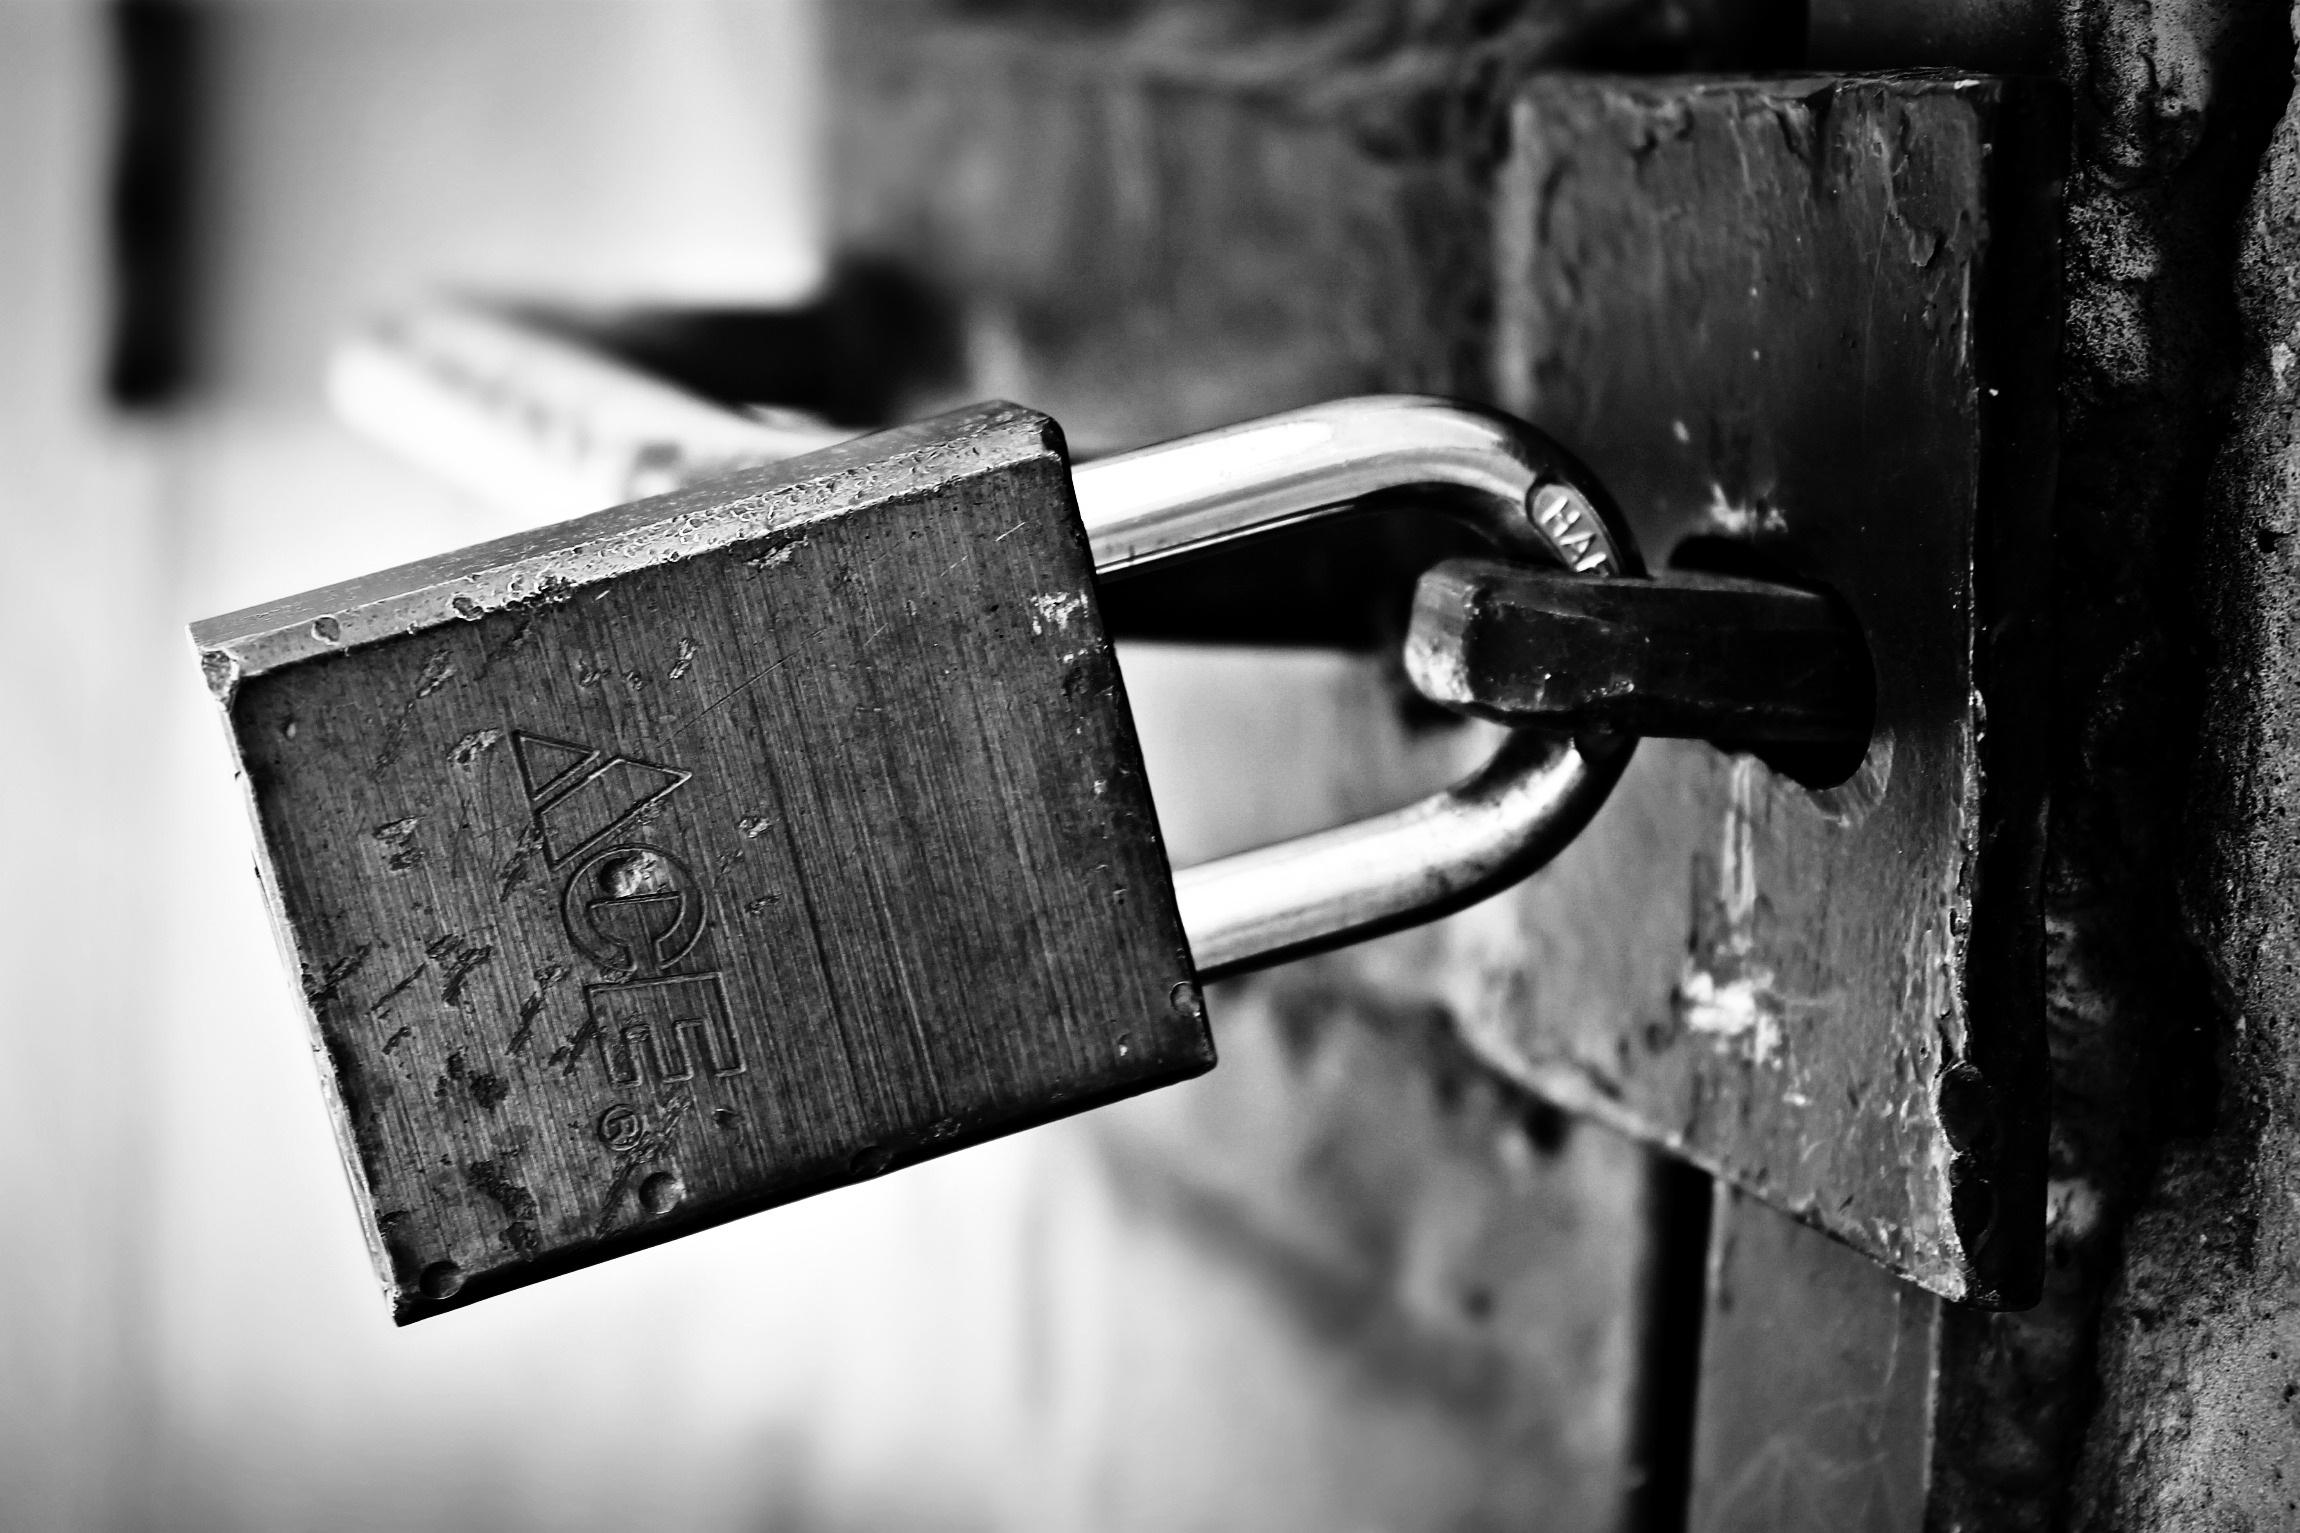 locked-1322793